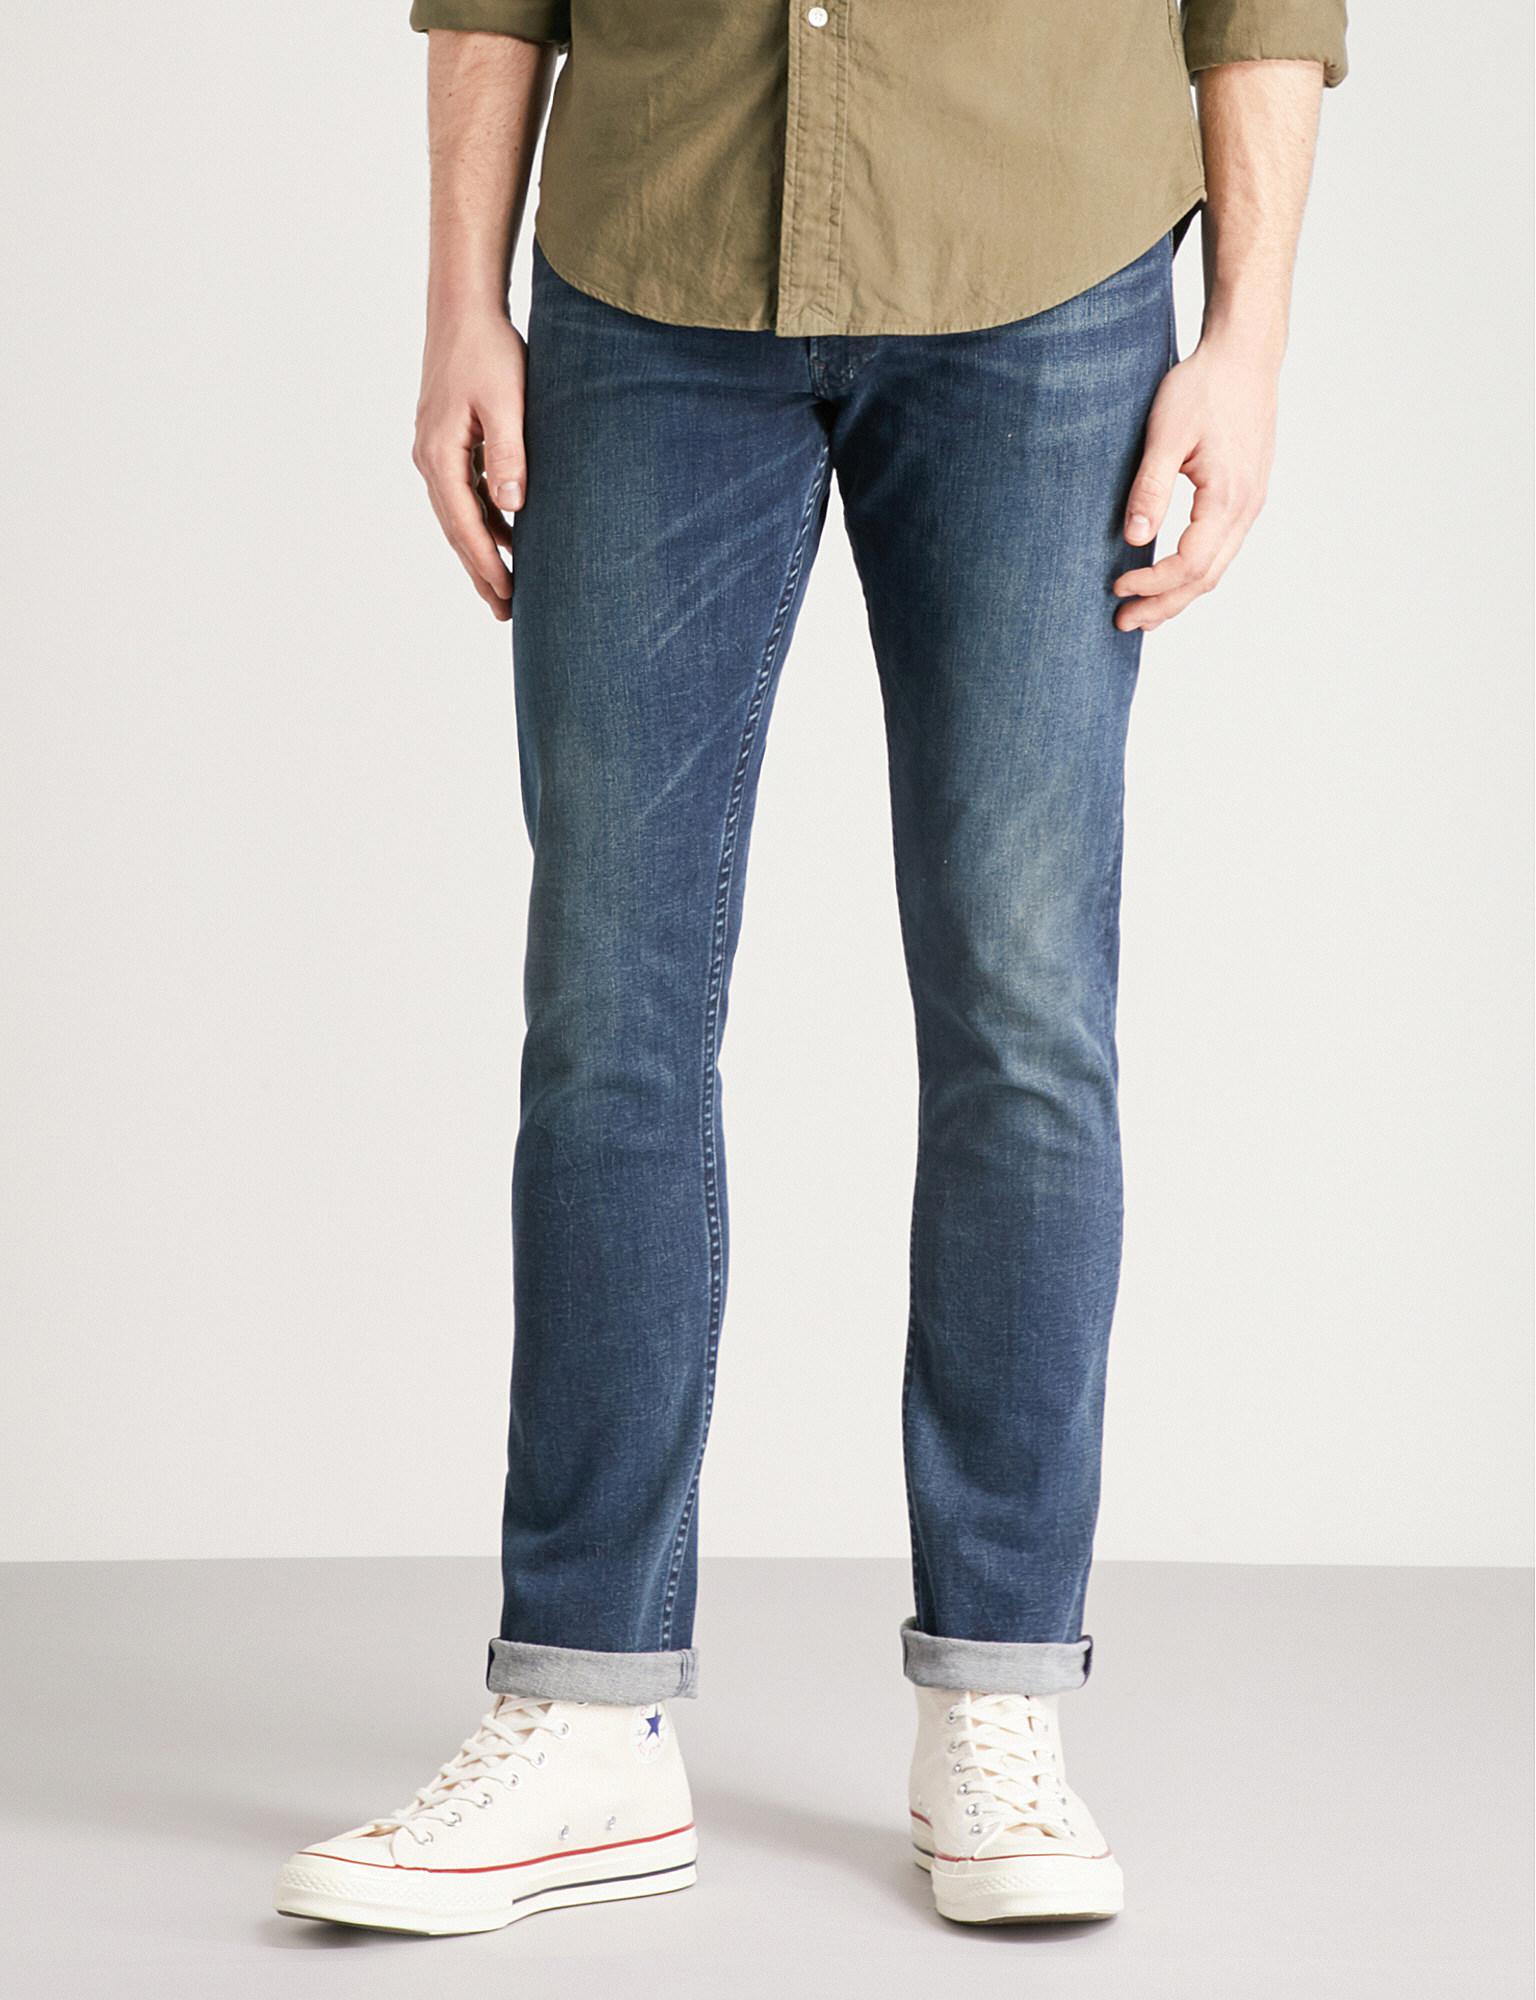 dab5eb381 Lyst - Polo Ralph Lauren Sullivan Slim-fit Straight Jeans in Blue ...